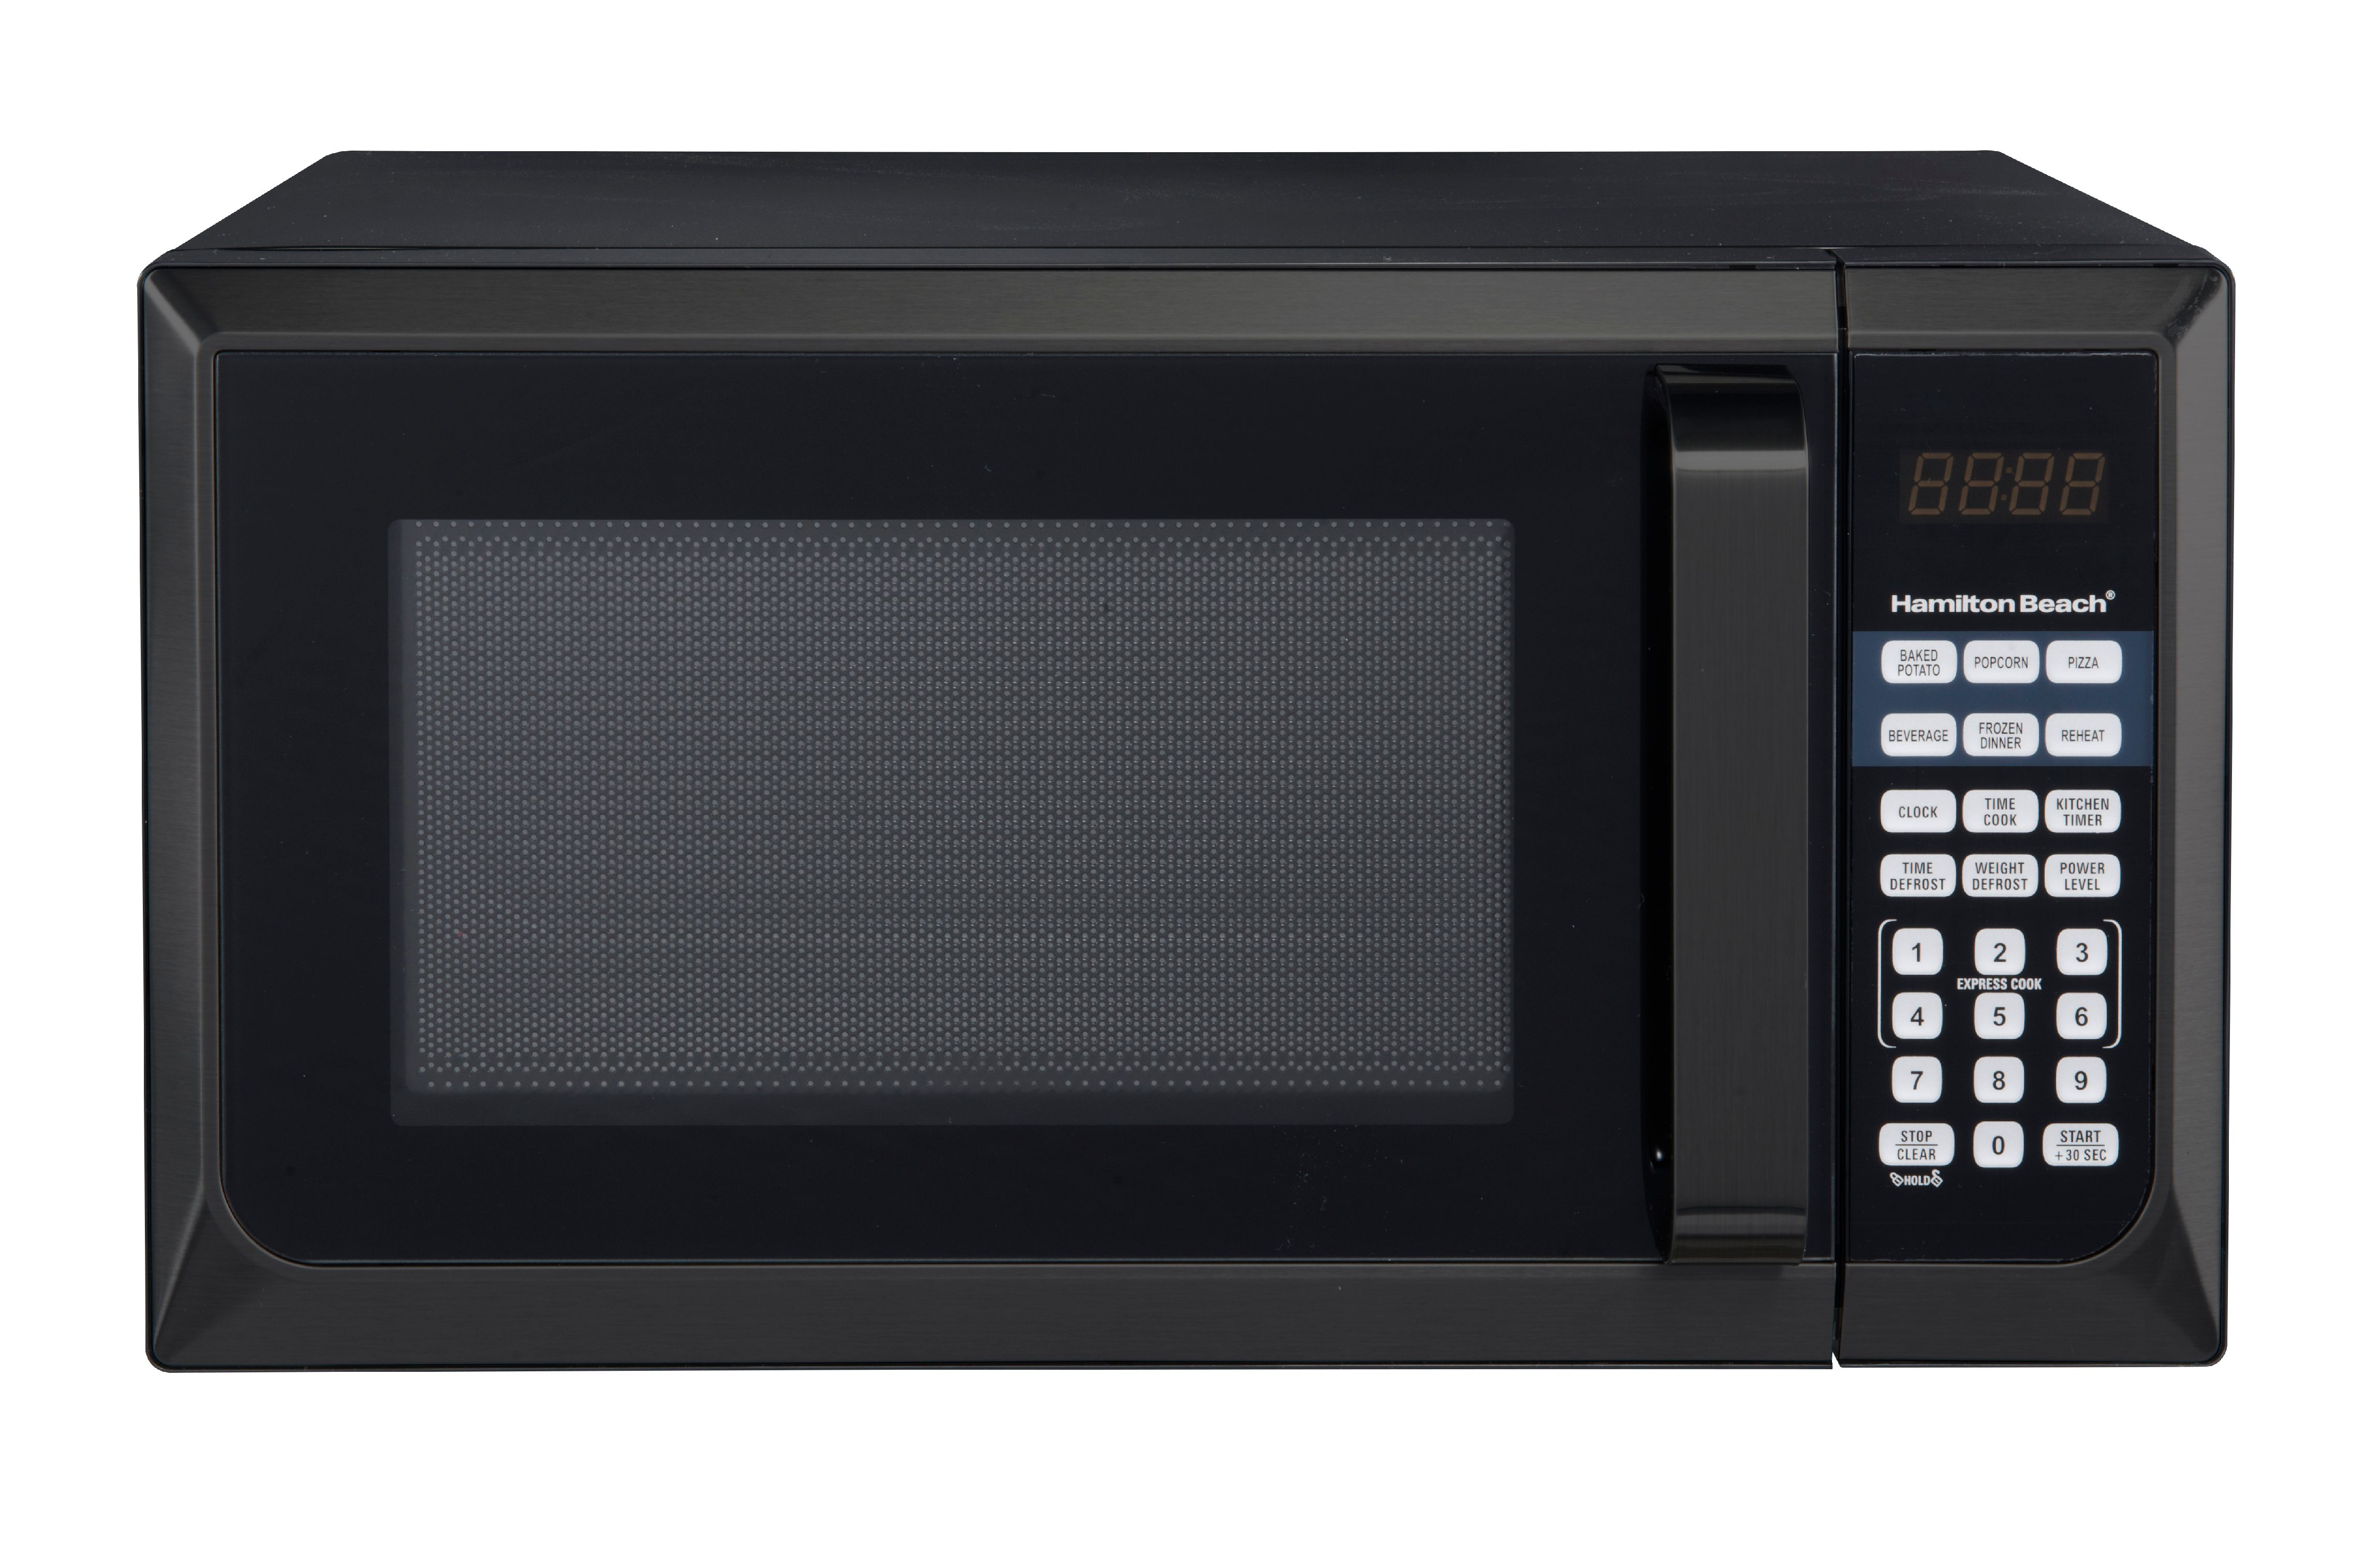 hamilton beach stainless steel 0 9 cu ft black microwave oven